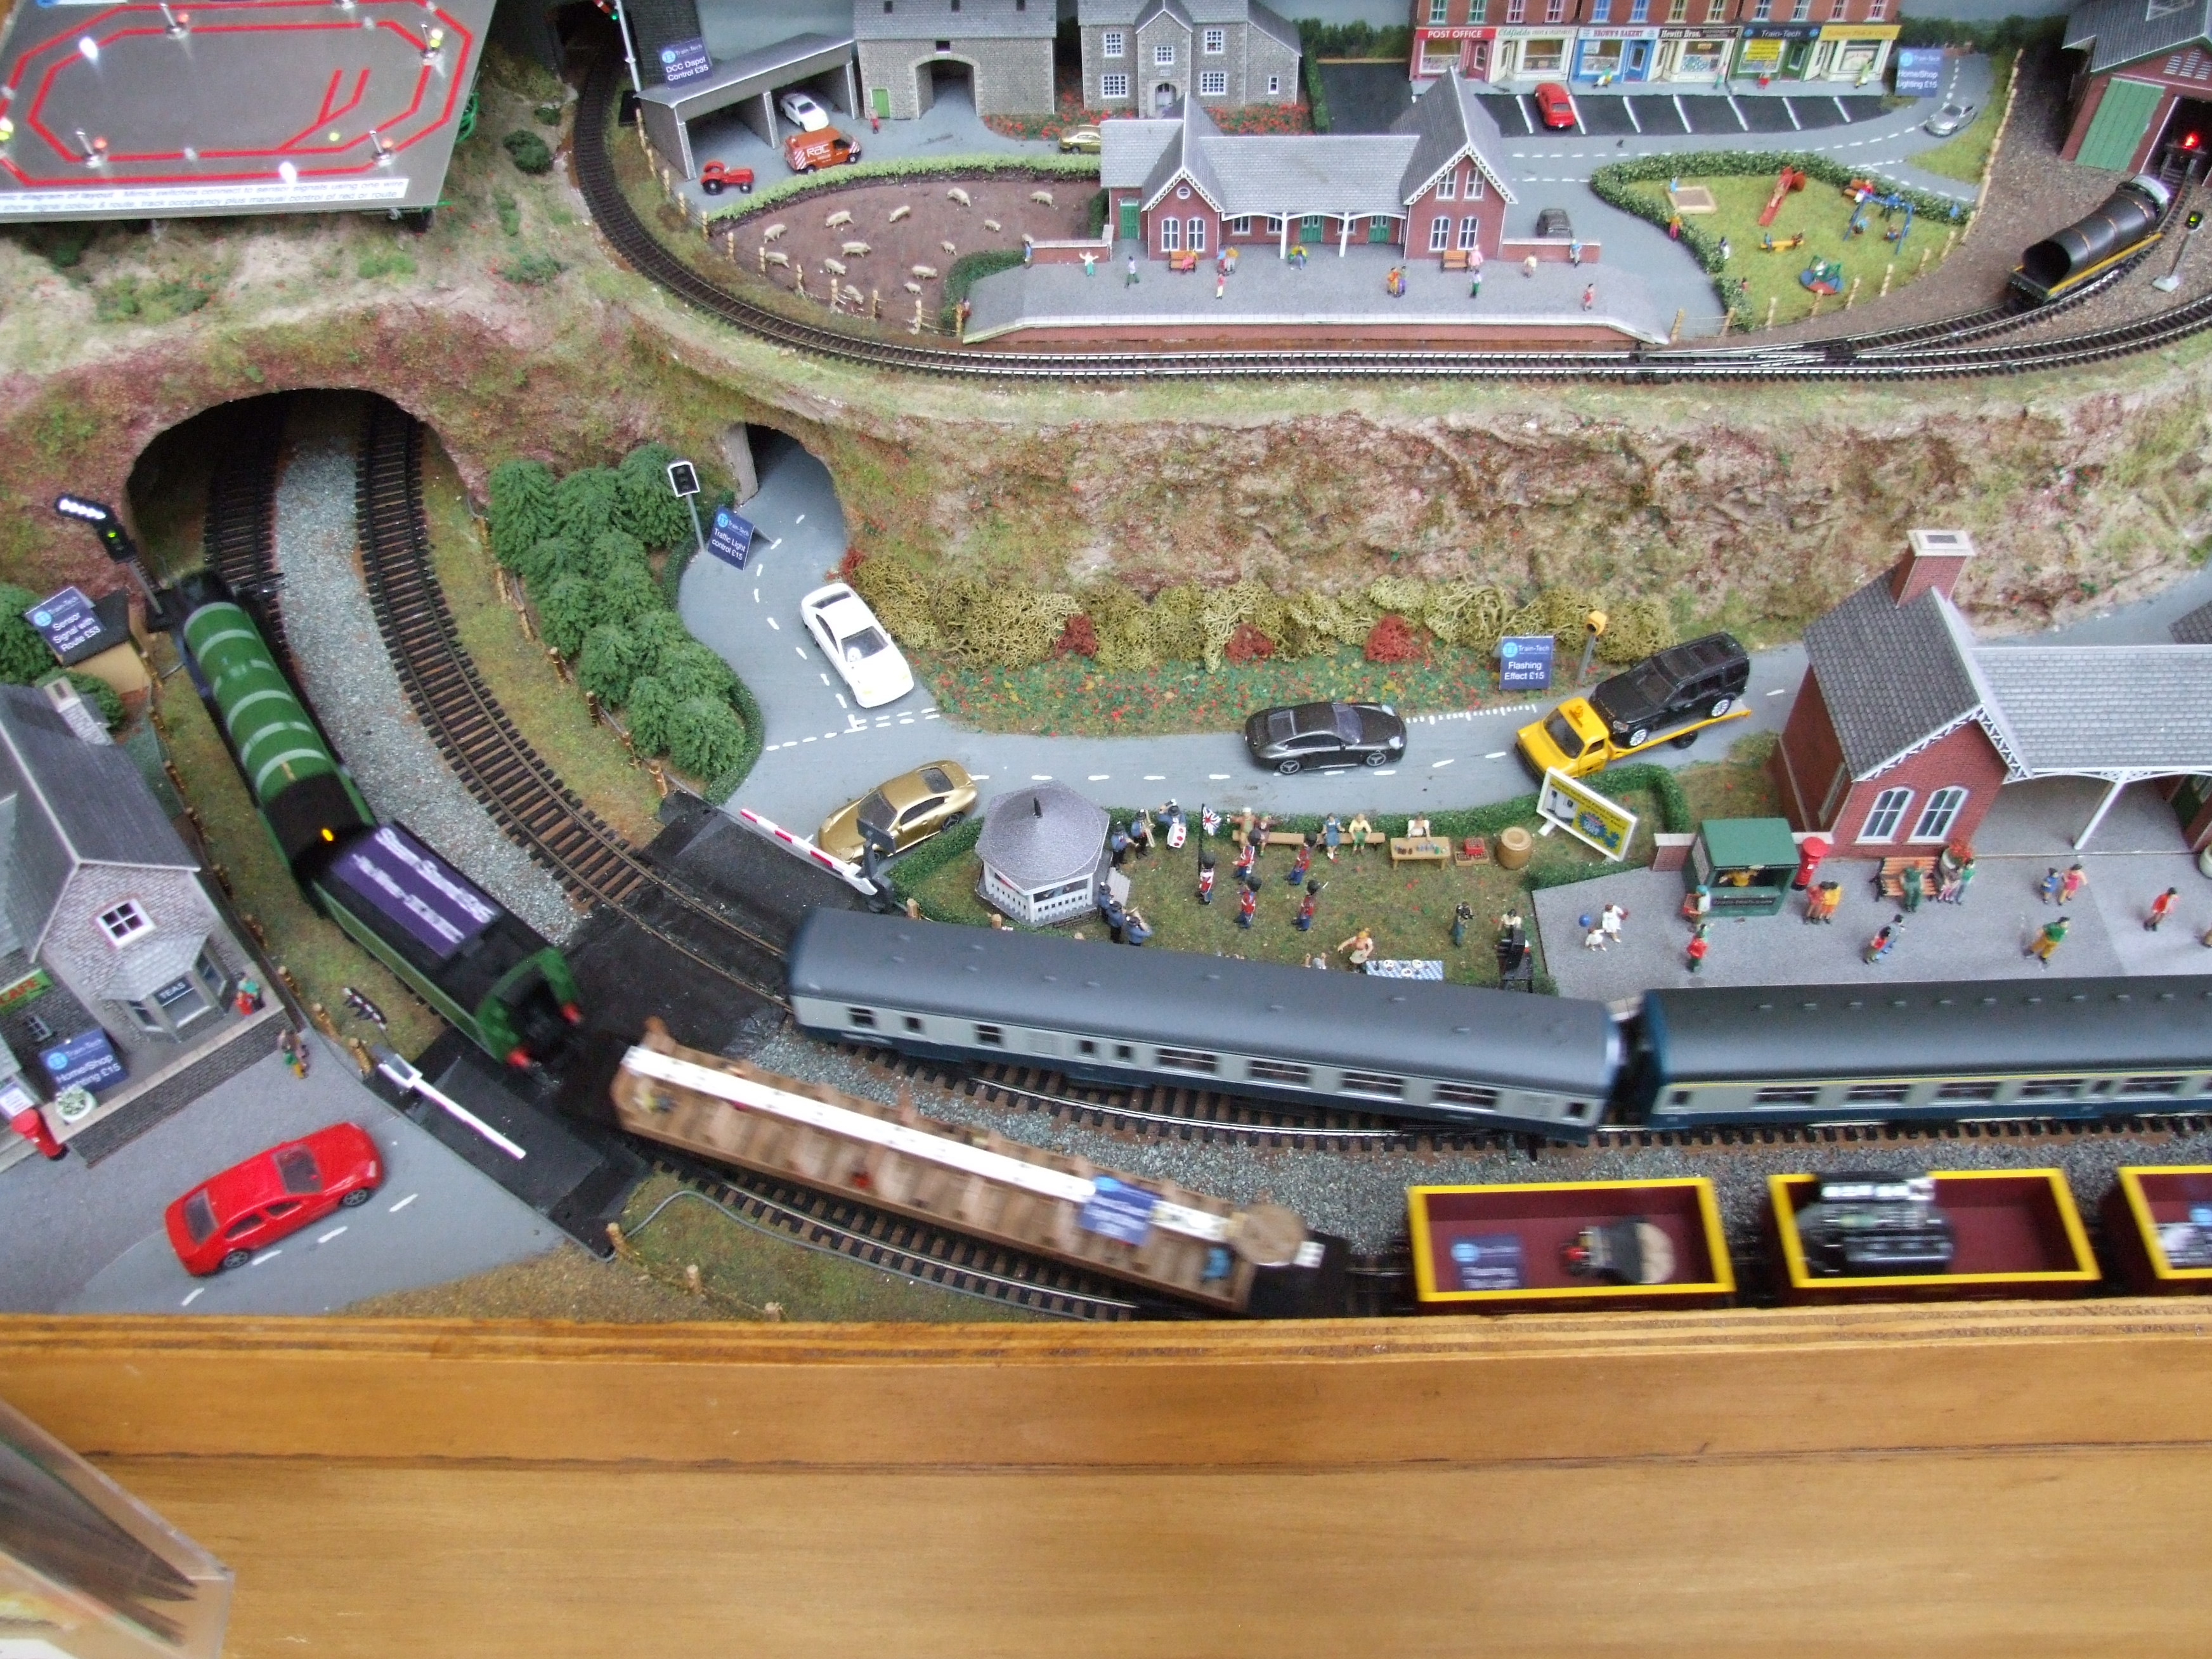 KLMRC Model Railway Exhibition 2018 – King's Lynn Model